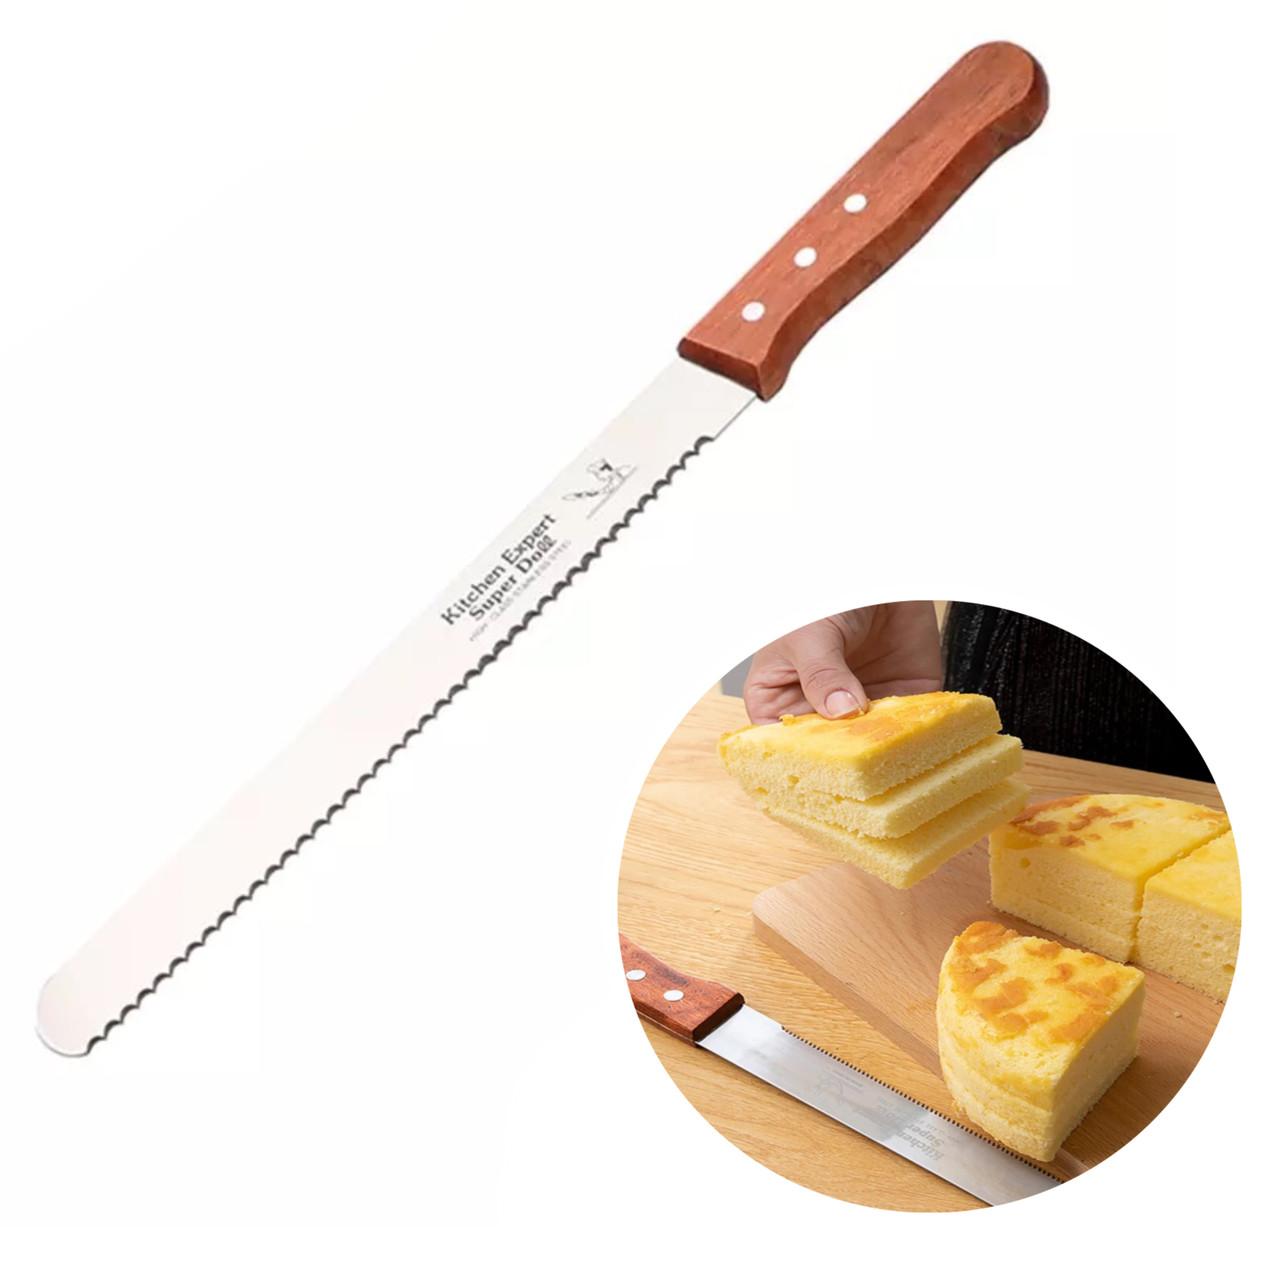 Нож для нарезки коржей крупный зубчик (32,5см)